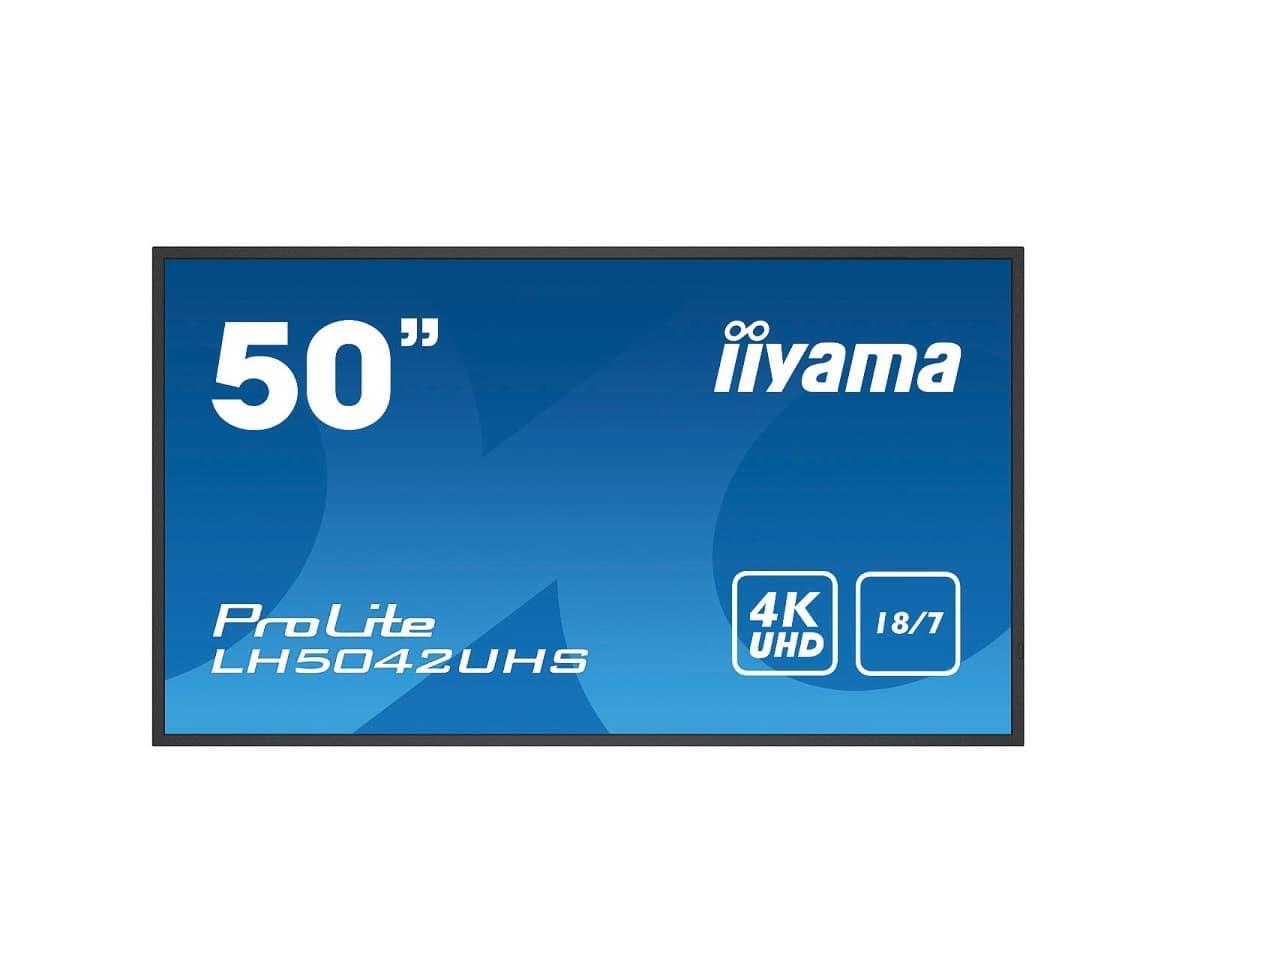 LH5042UHS digital signage kijelzo 1 Vizuáltechnika bolt